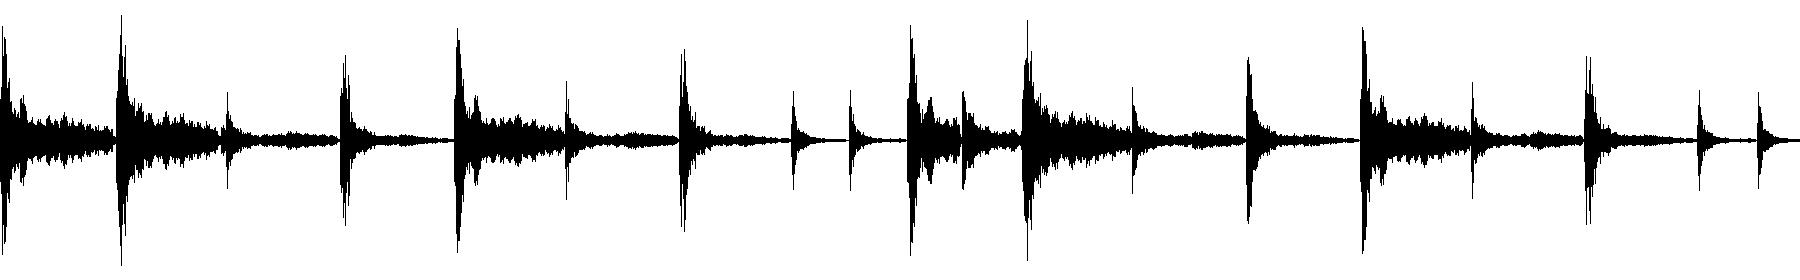 arab percussion loop 2